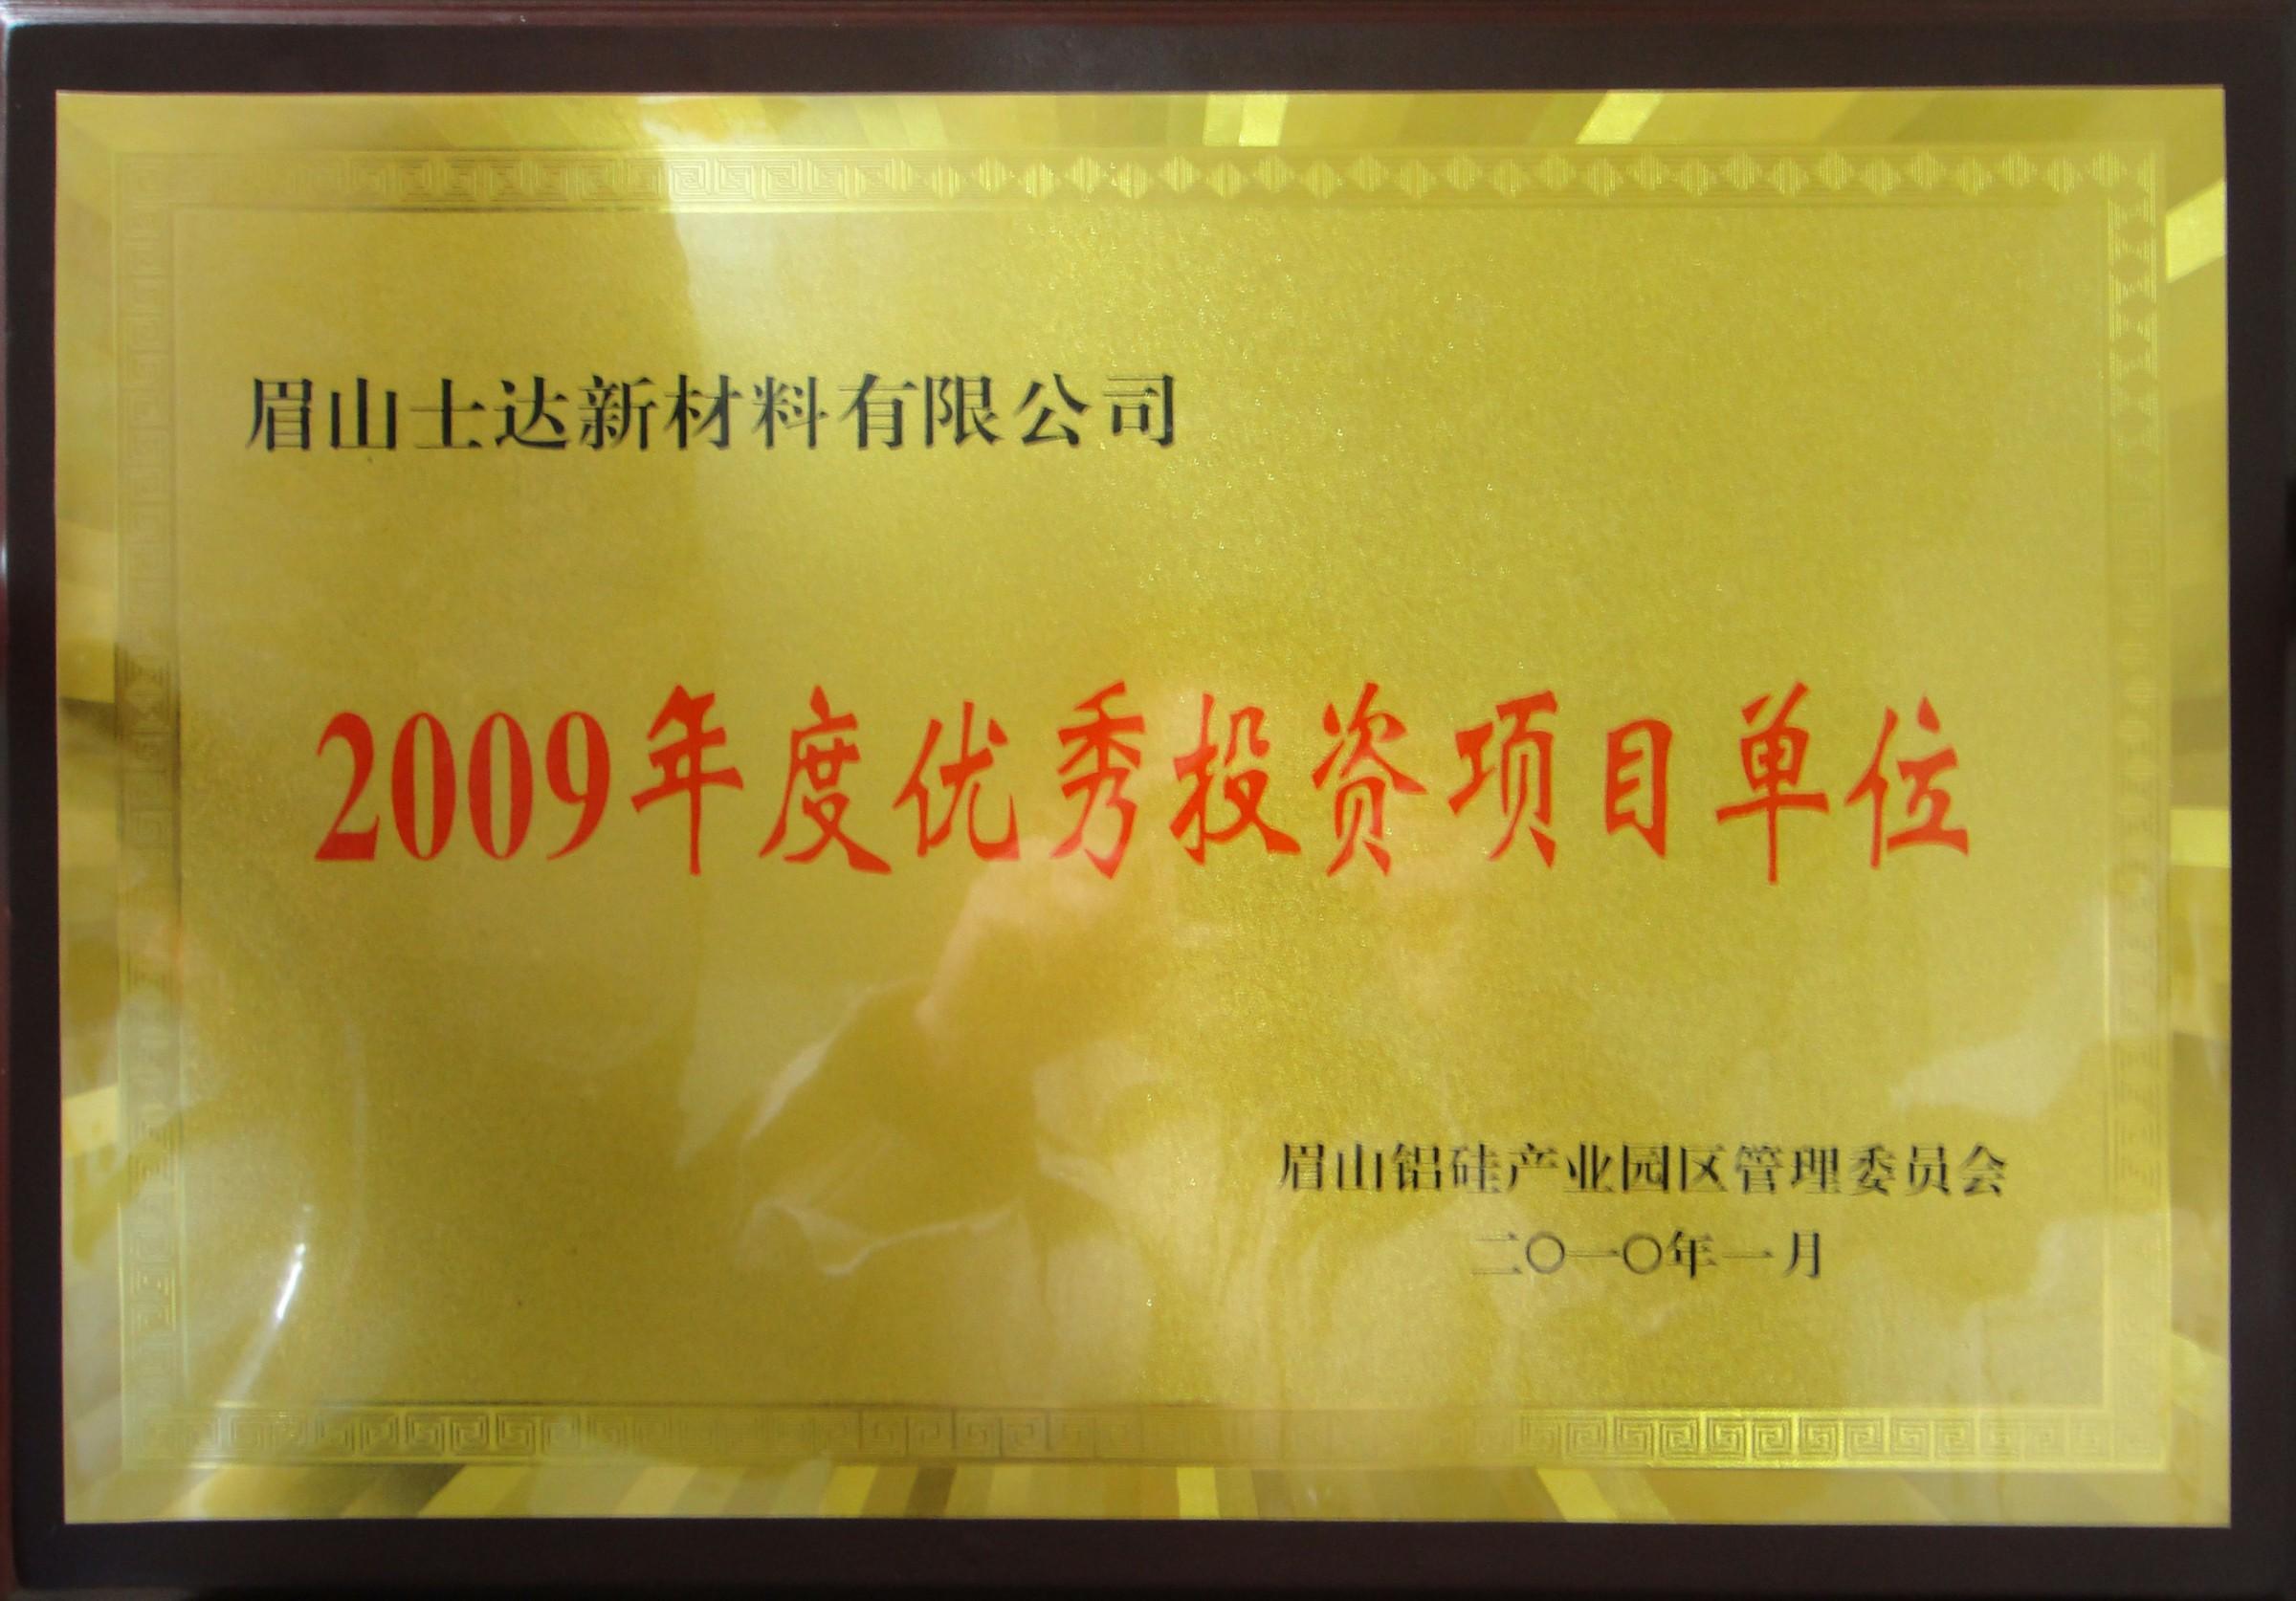 <span>2009年度优秀投资项目单位</span>